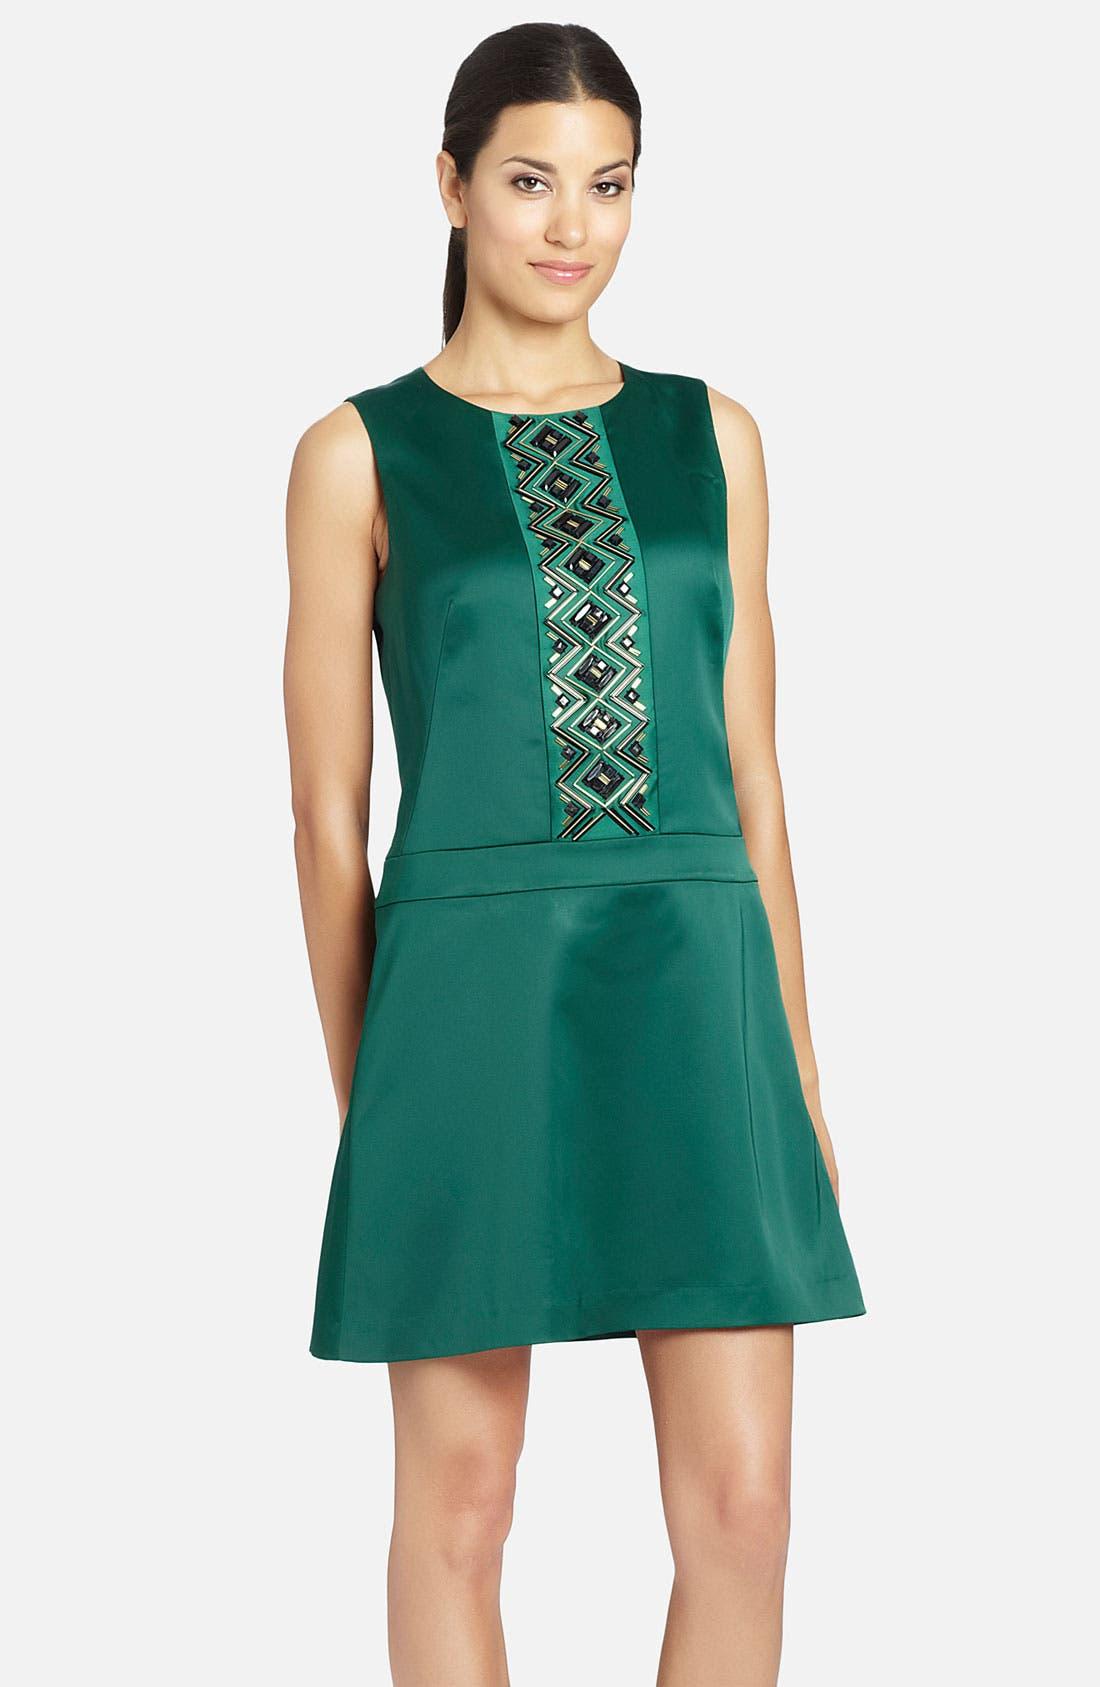 Main Image - Cynthia Steffe 'Ava' Art Deco Pattern Satin Dress